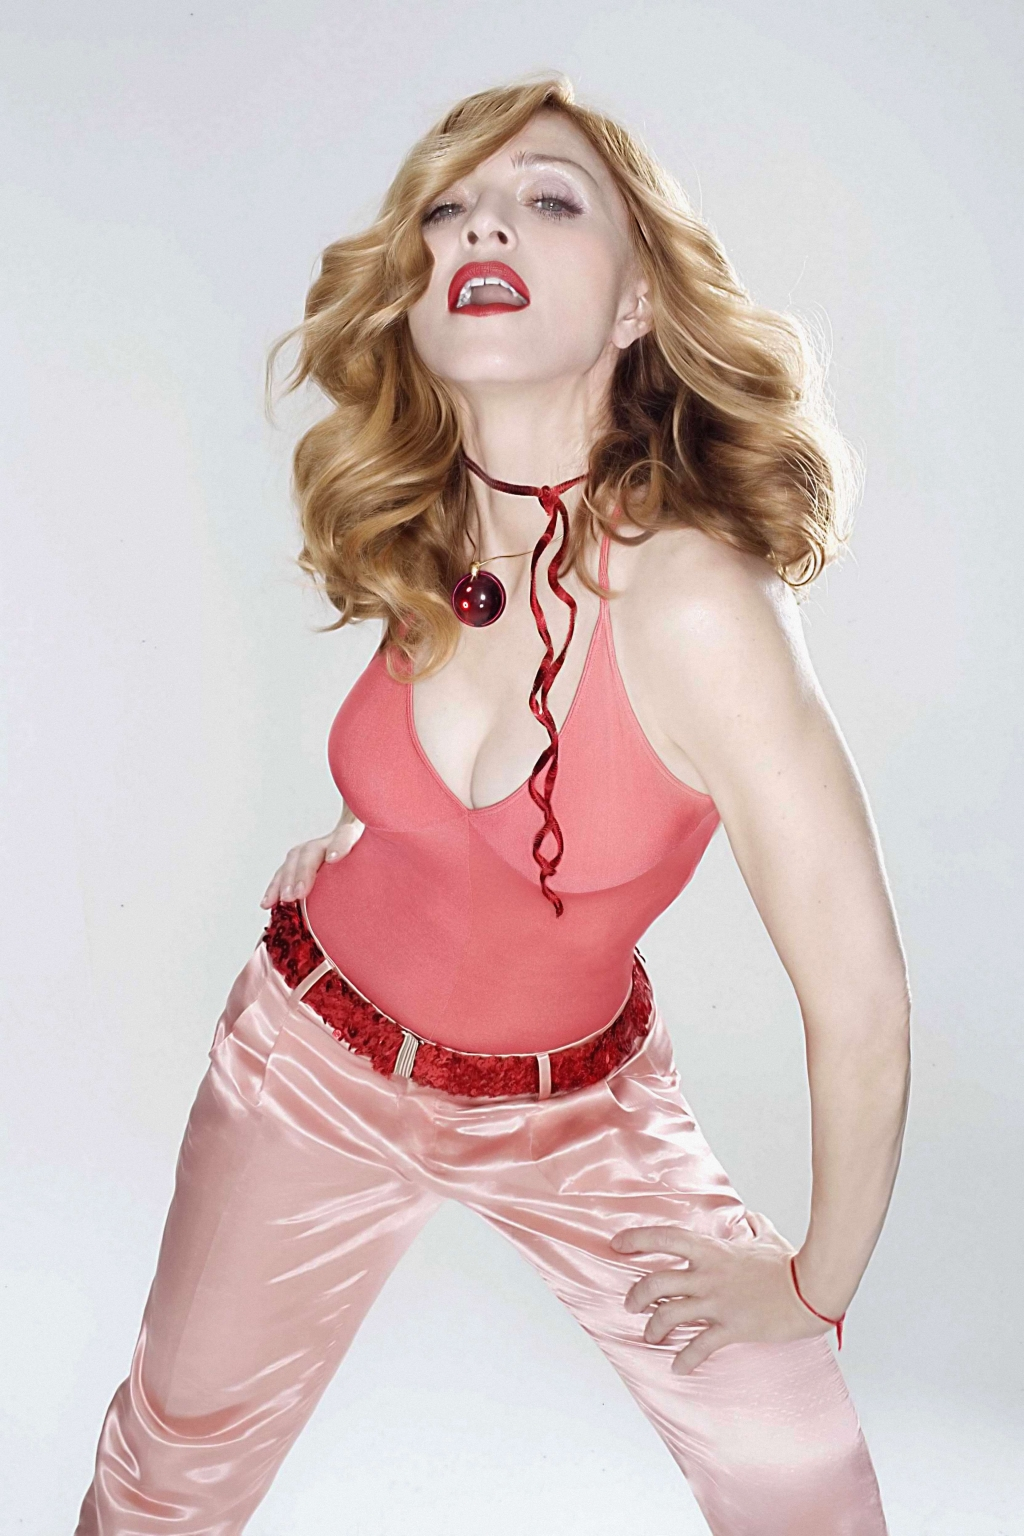 http://4.bp.blogspot.com/-y5VgRmEfUco/UGdkhF8cdBI/AAAAAAAABoM/guXzjGWERbo/s1600/madonna-in-shirred-sleeveless-with-satin-belted-pants-person-photo-u1.jpg